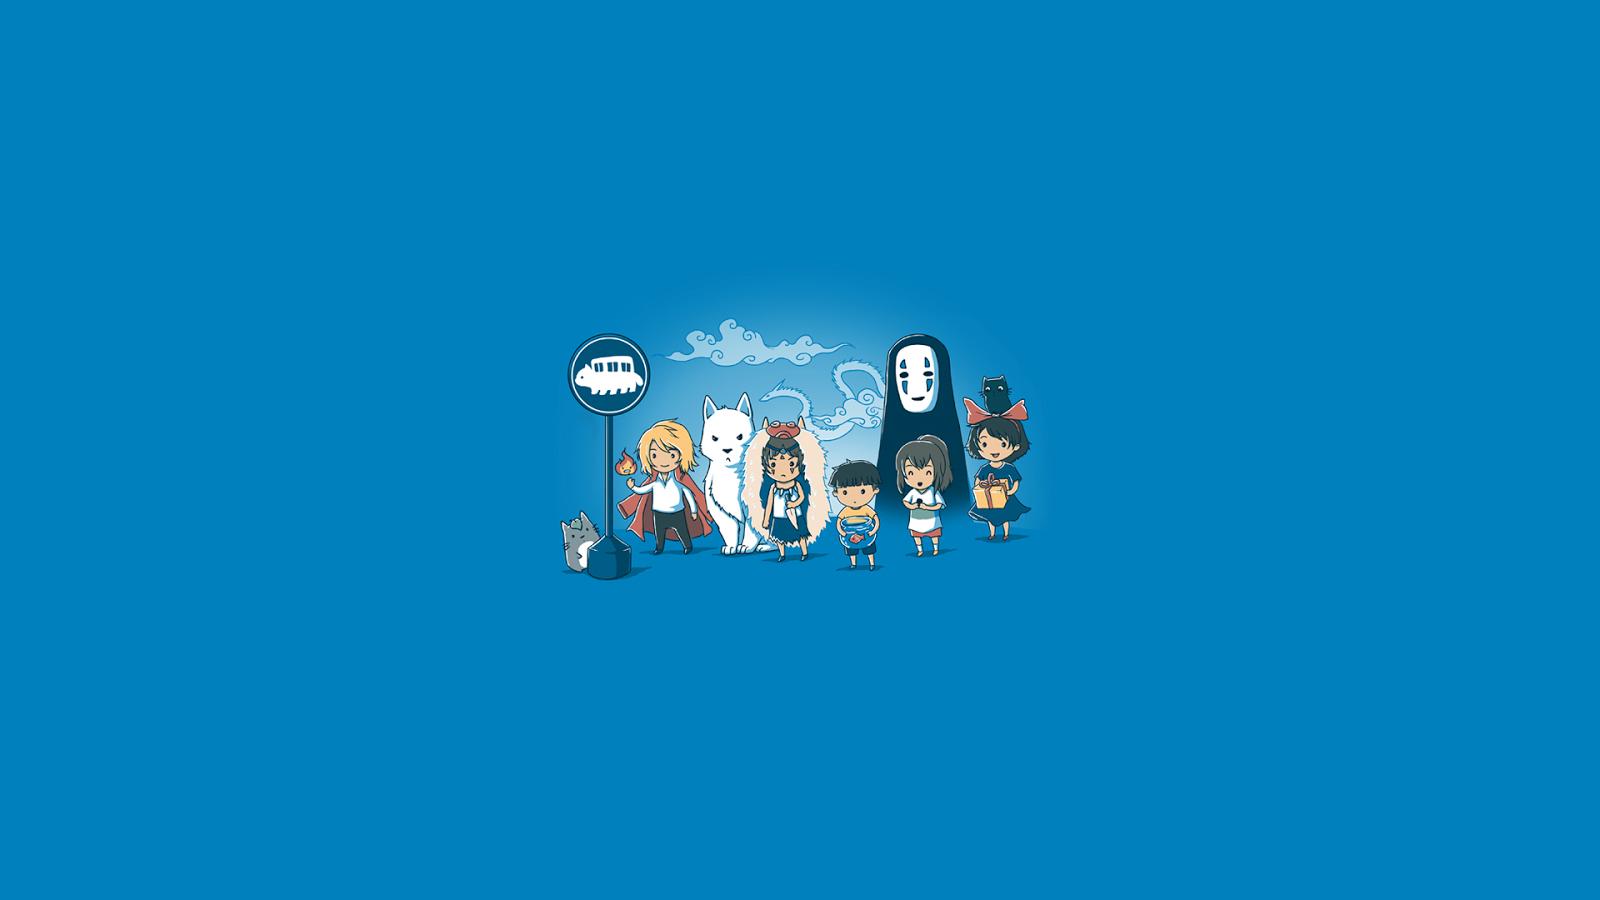 Wallpaper Hd Studio Ghibli Joy Studio Design Gallery 1600x900